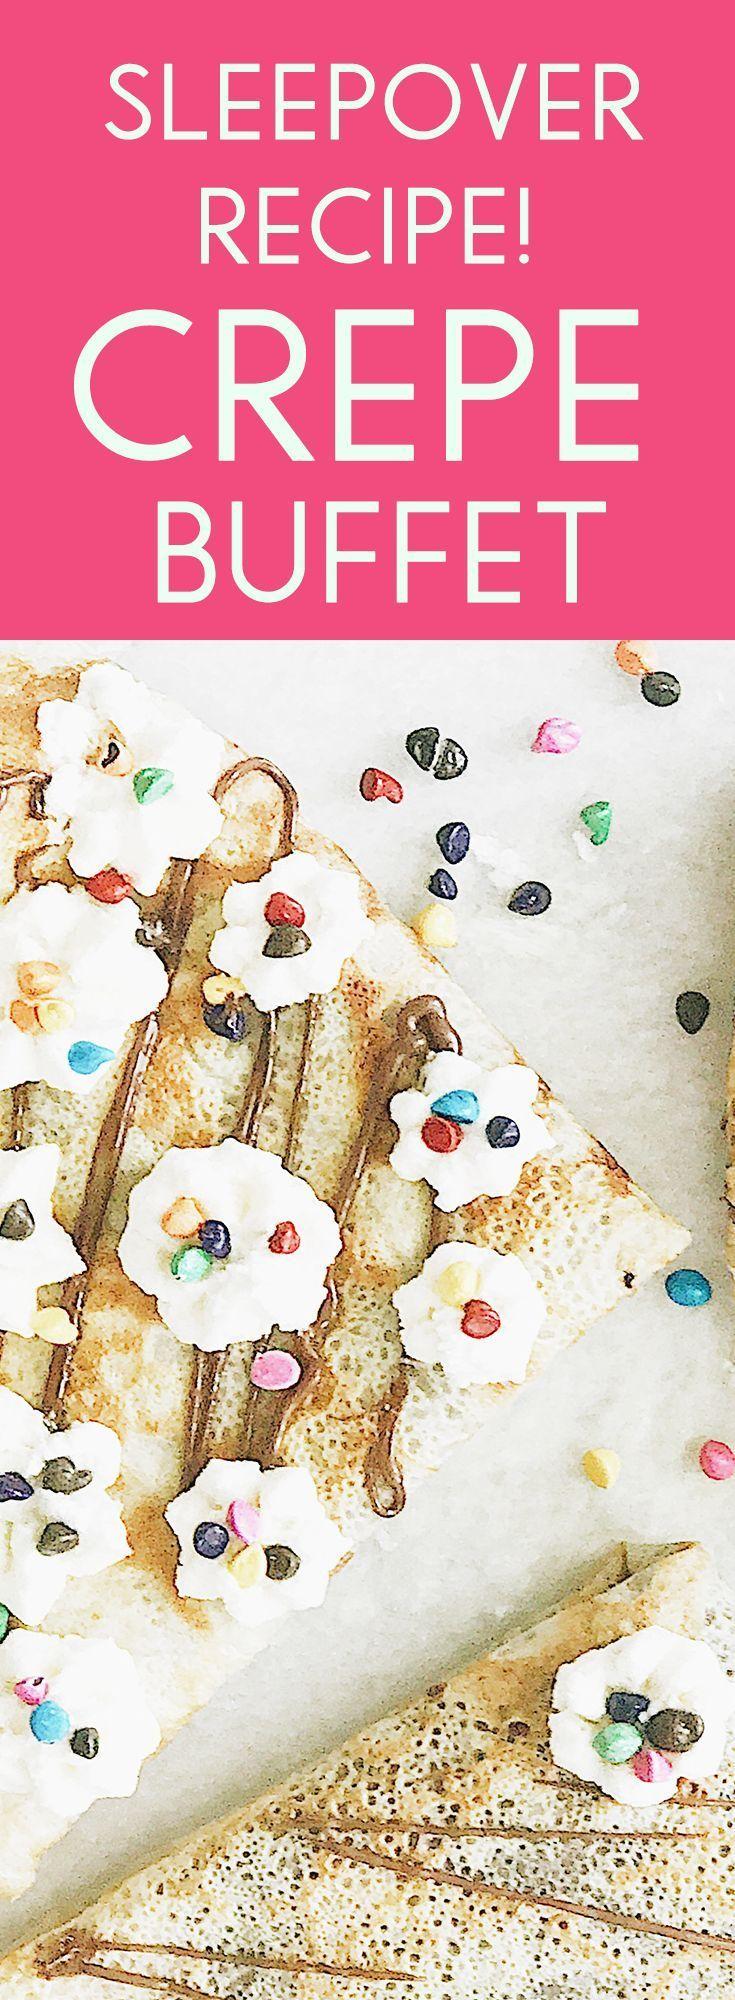 Easy crepe buffet recipes for kids' sleepover breakfast fun!